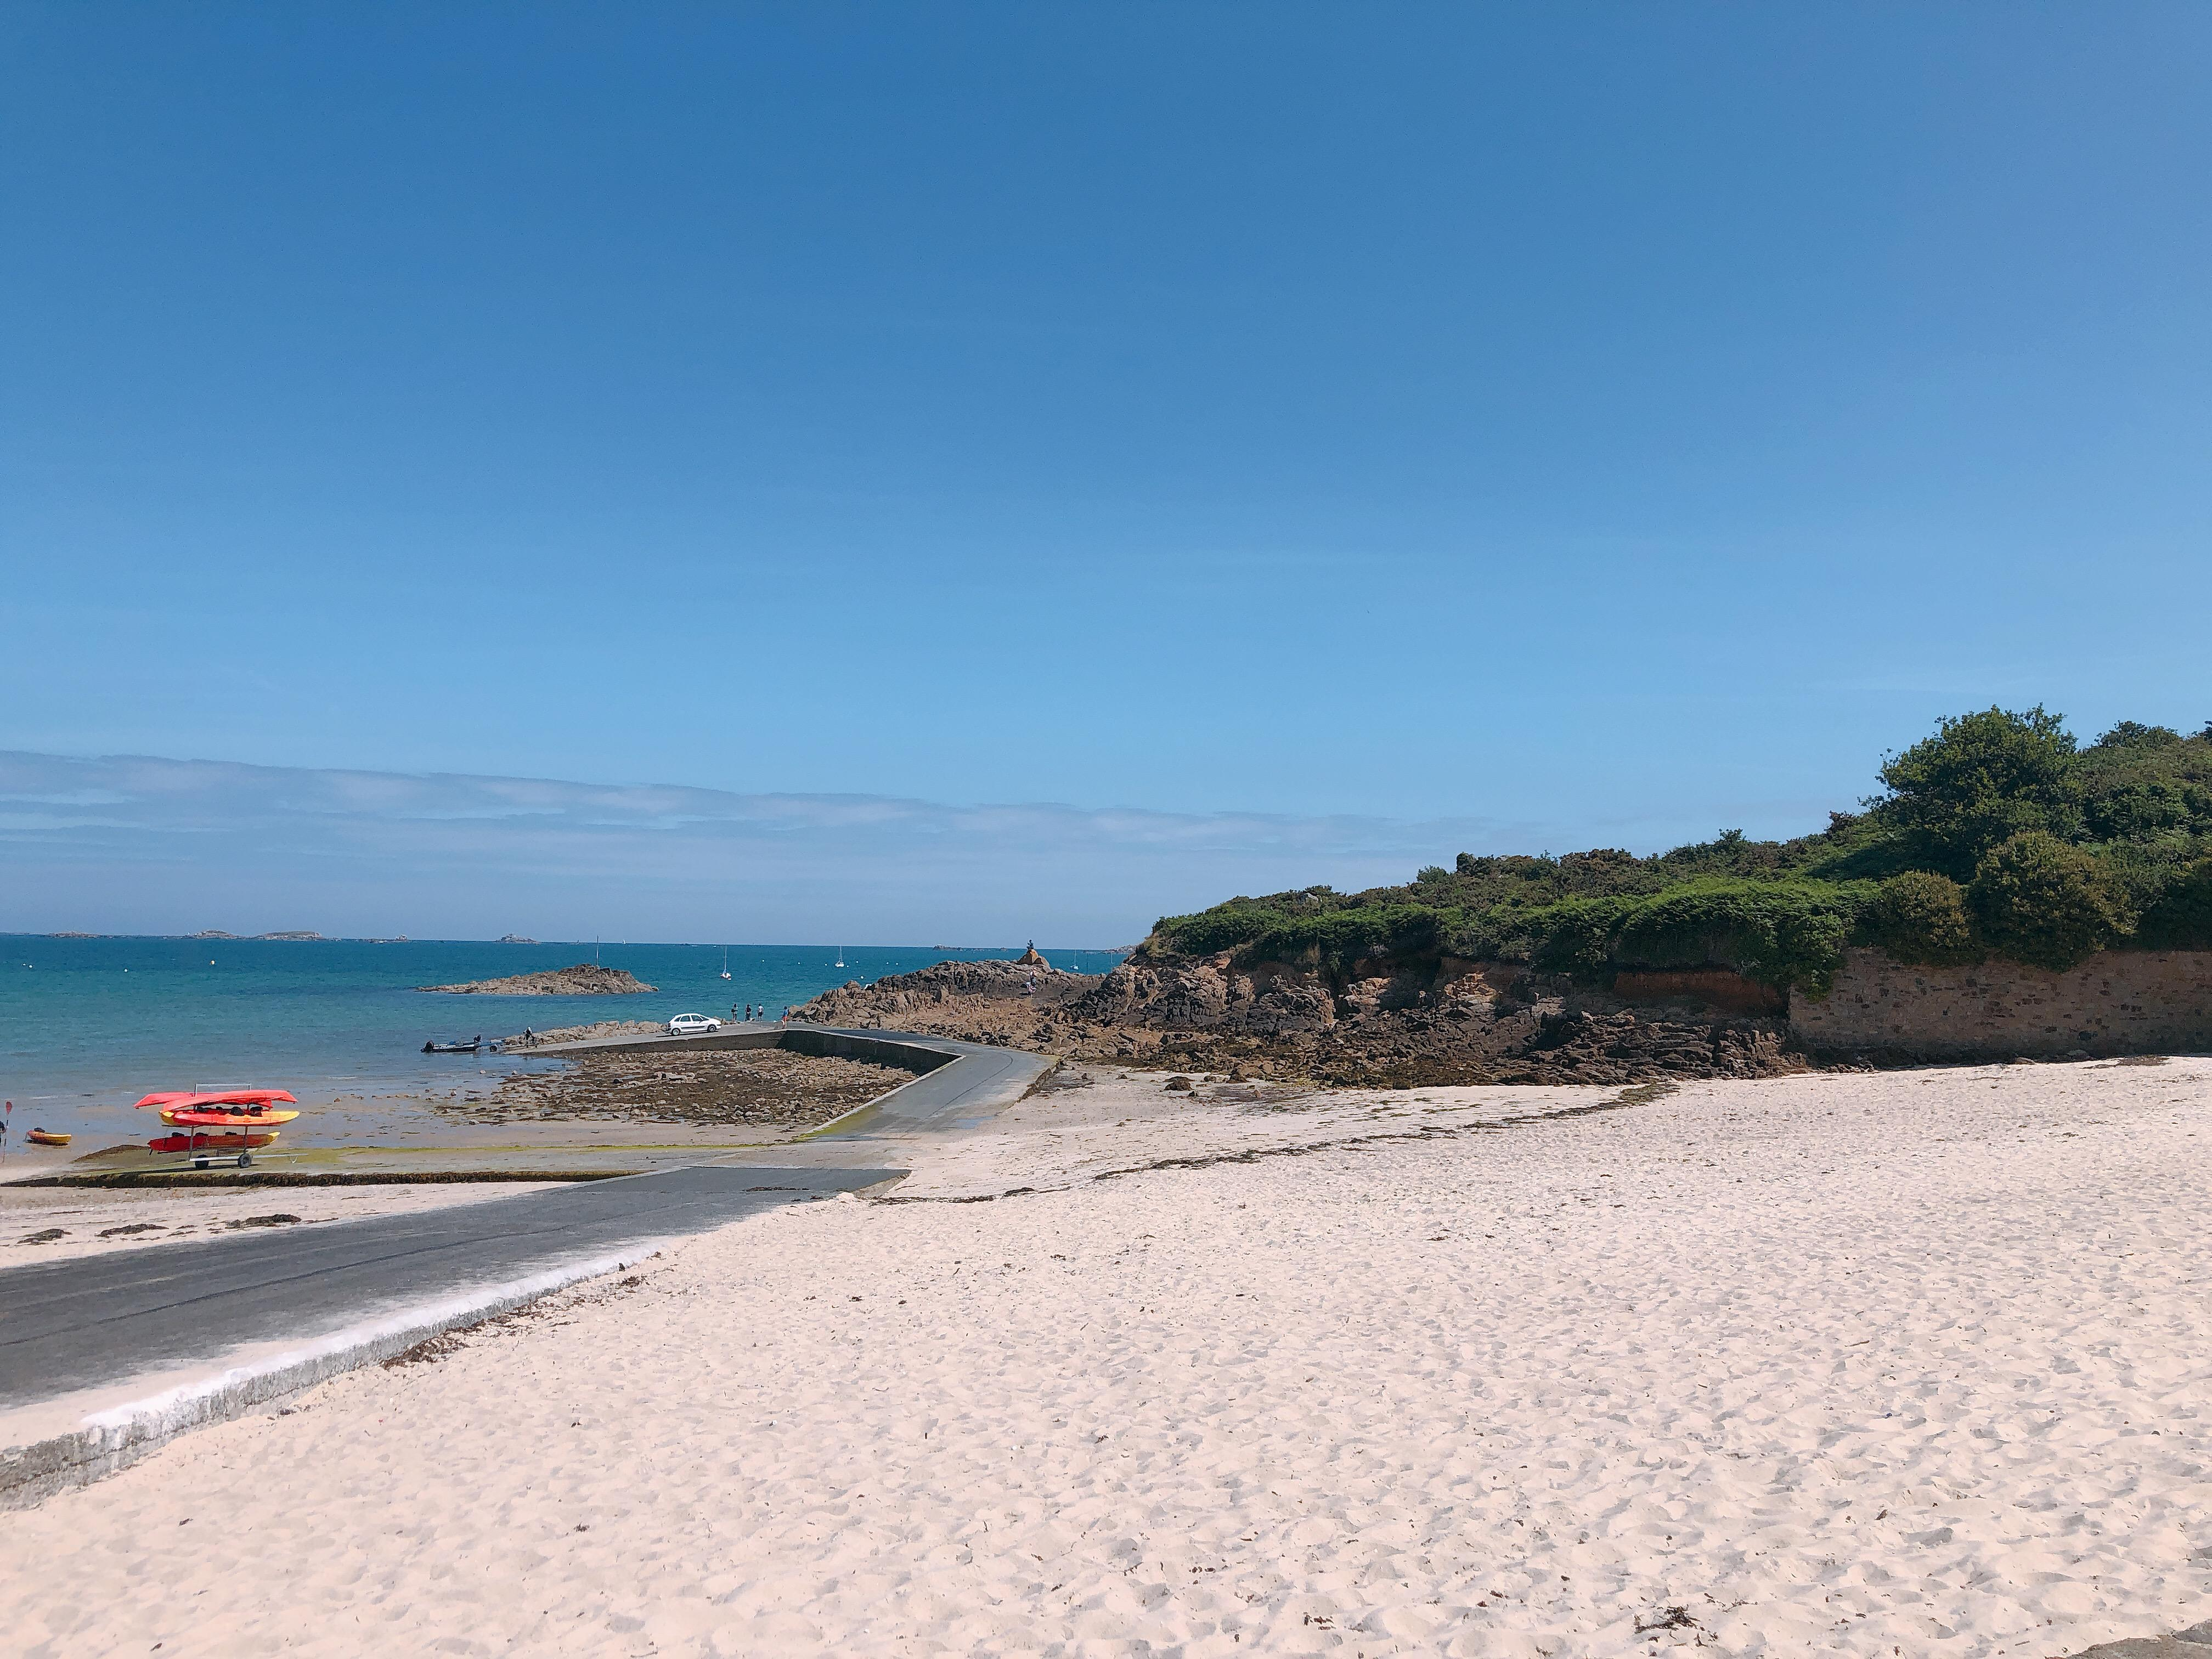 IMG 9394 4032x3024 - Fotodagboek Vakantie: Camping Les Mouettes, Bretagne!